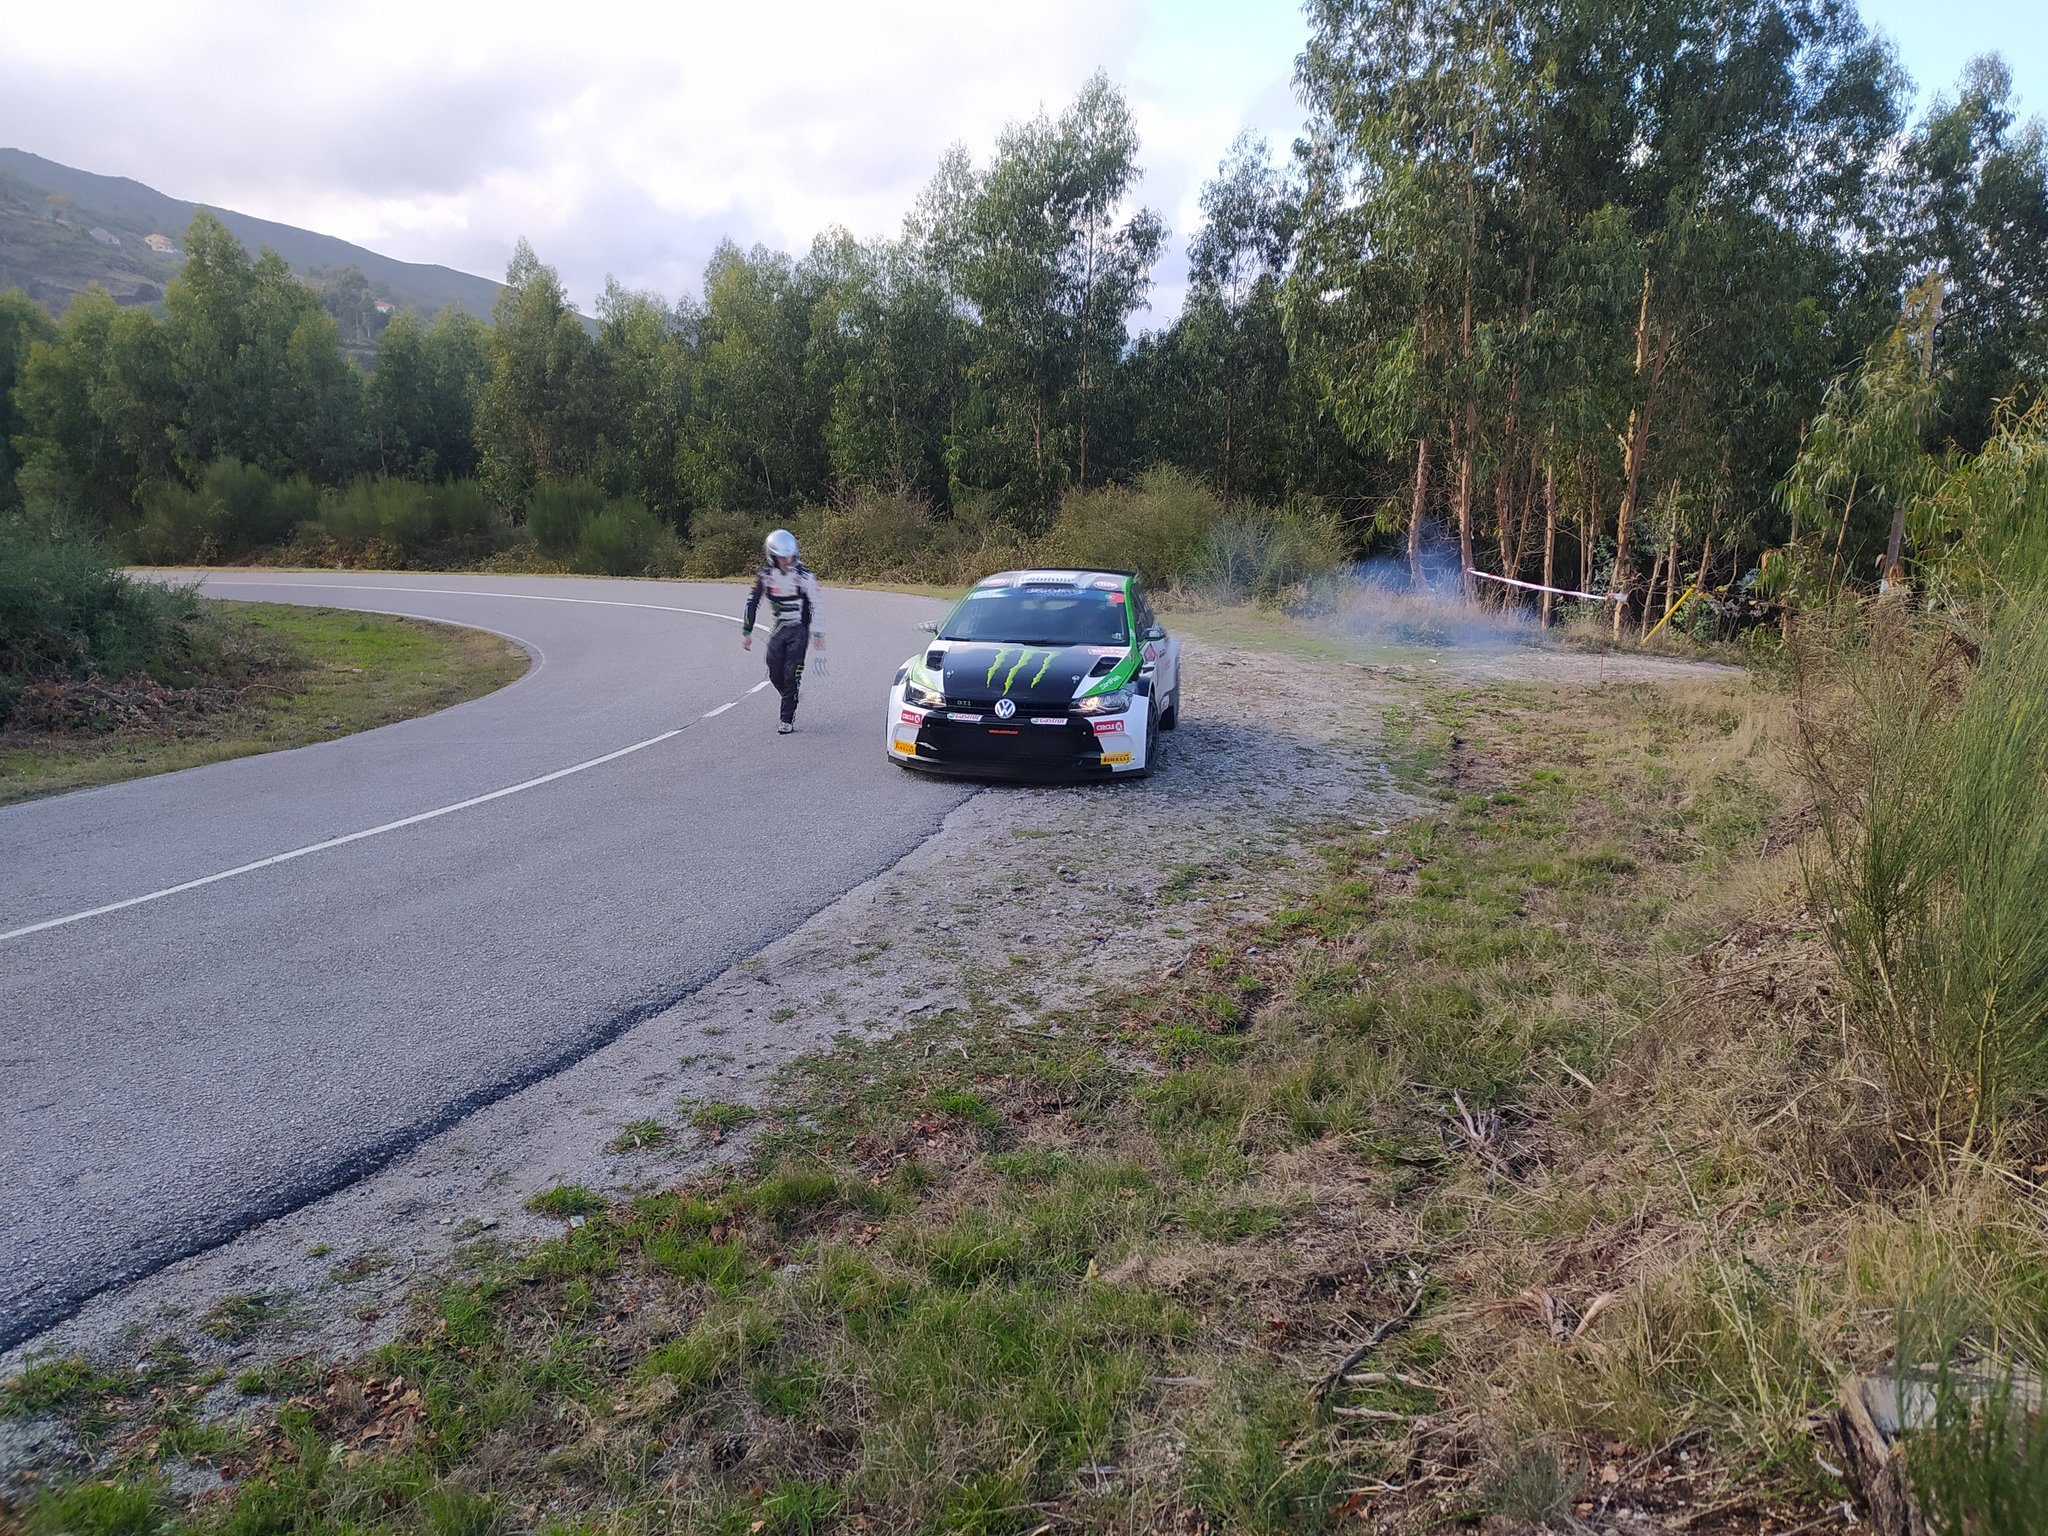 ERC: Rally Fafe Montelongo [2-4 Octubre] - Página 3 EjarHmWWsAQwUbf?format=jpg&name=large